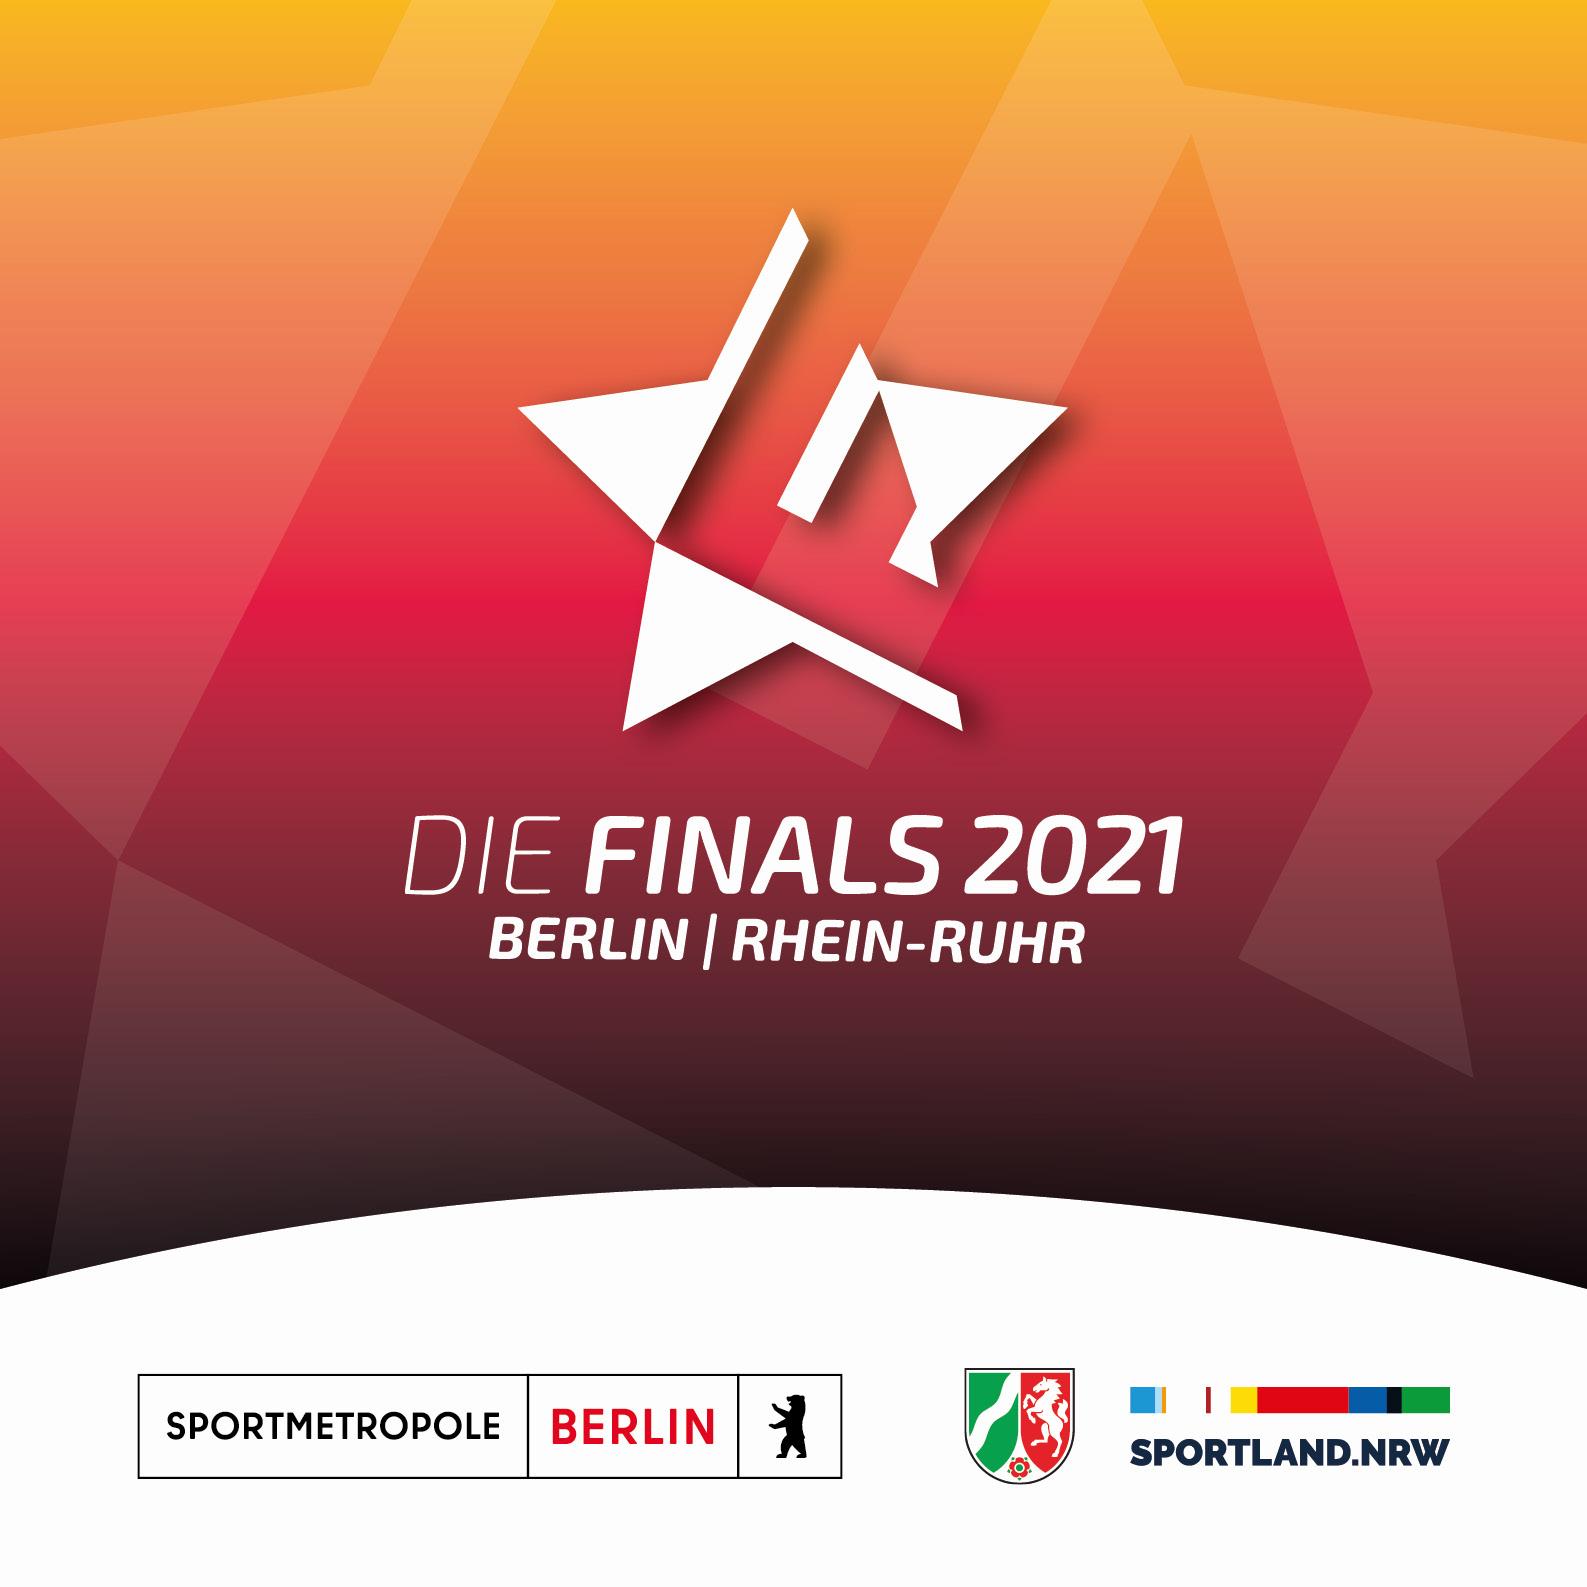 Die Finals 2021 Fünfkampf